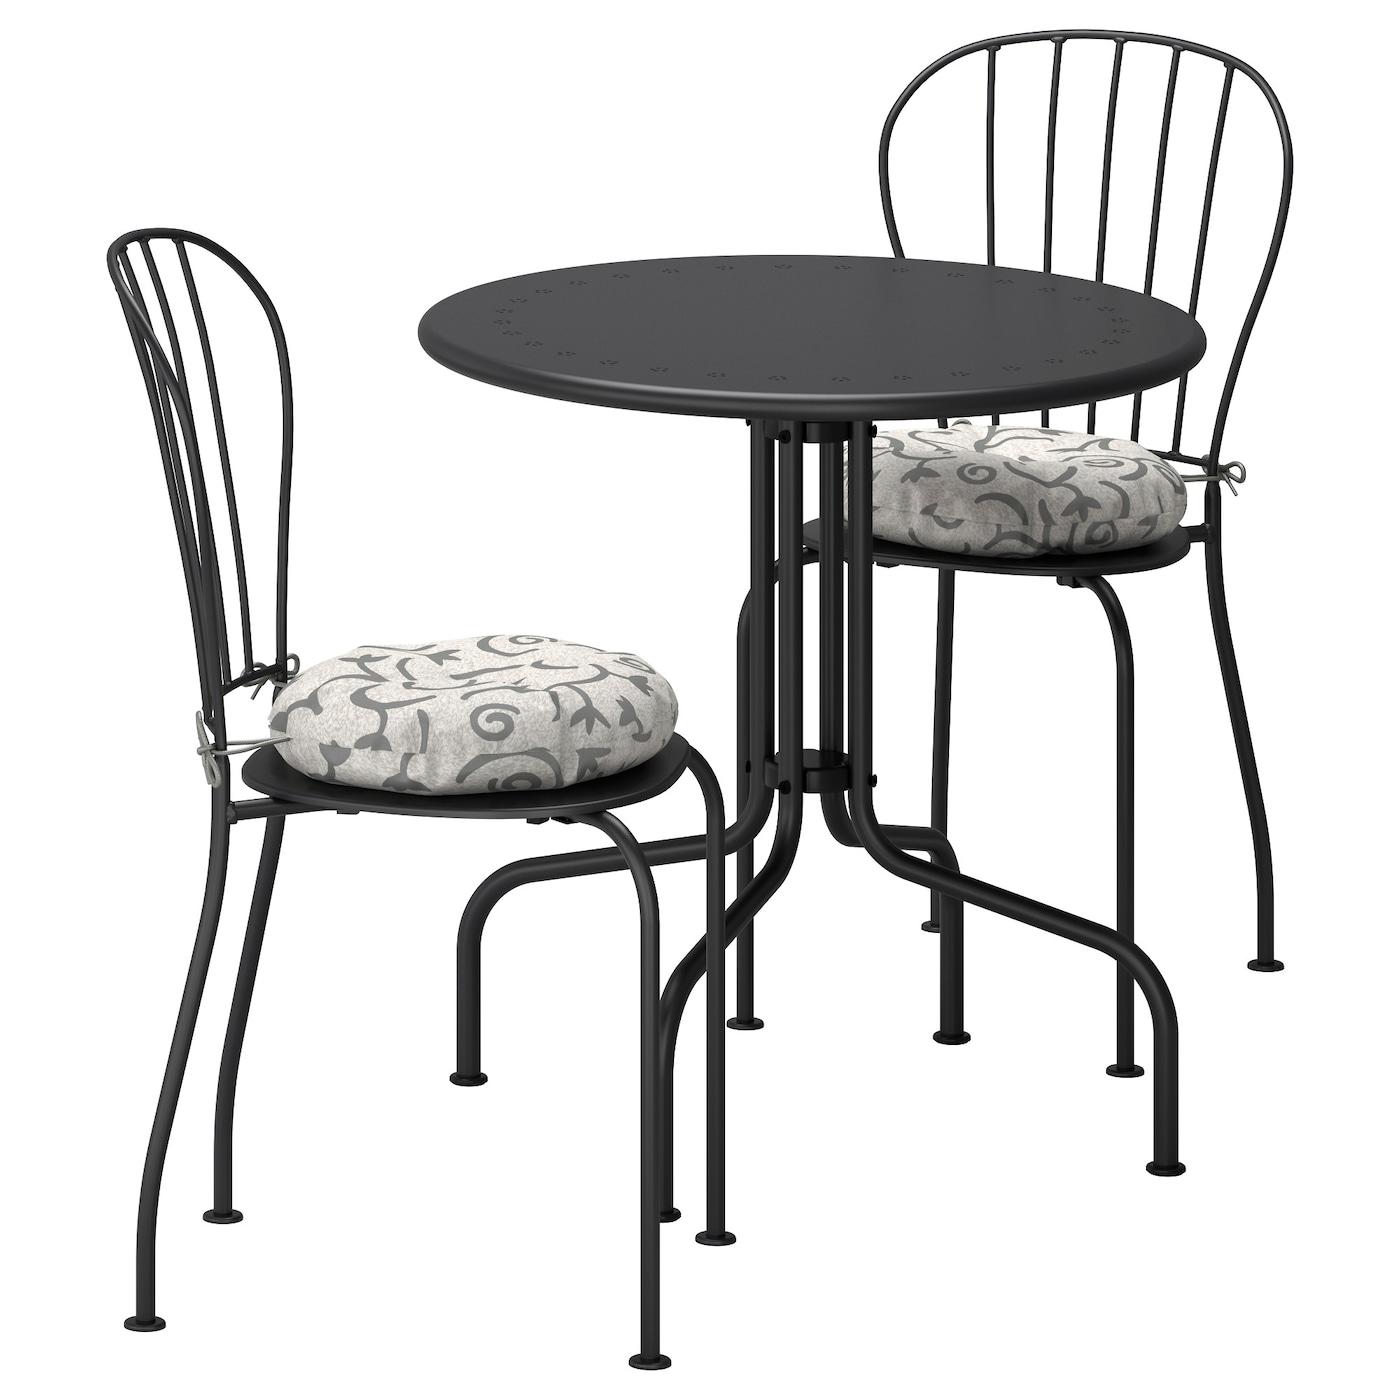 table chaise de jardin ikea. Black Bedroom Furniture Sets. Home Design Ideas